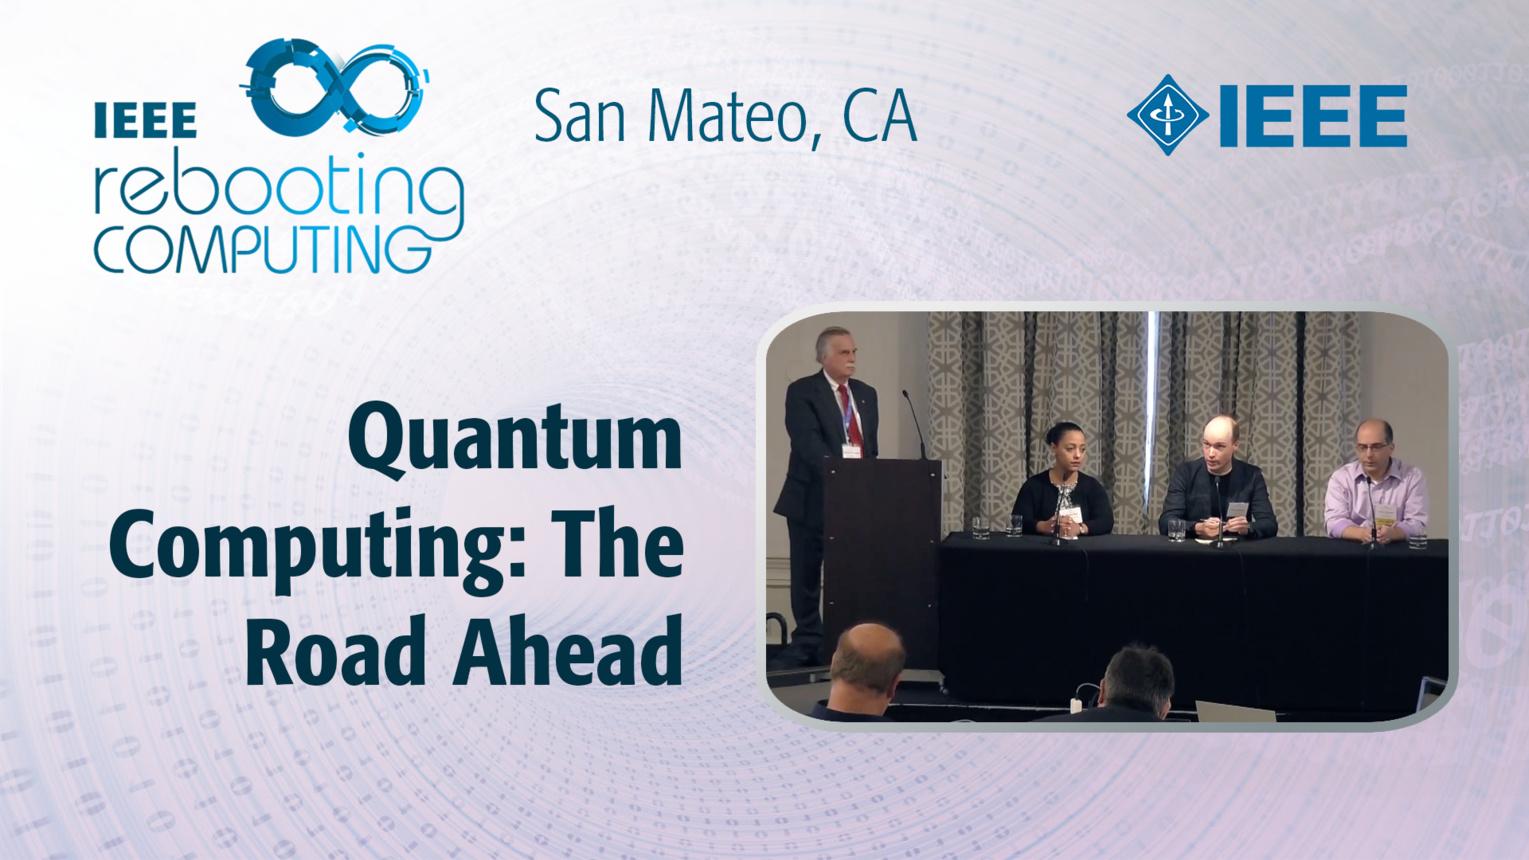 Quantum Computing Panel - The Road Ahead - ICRC San Mateo, 2019